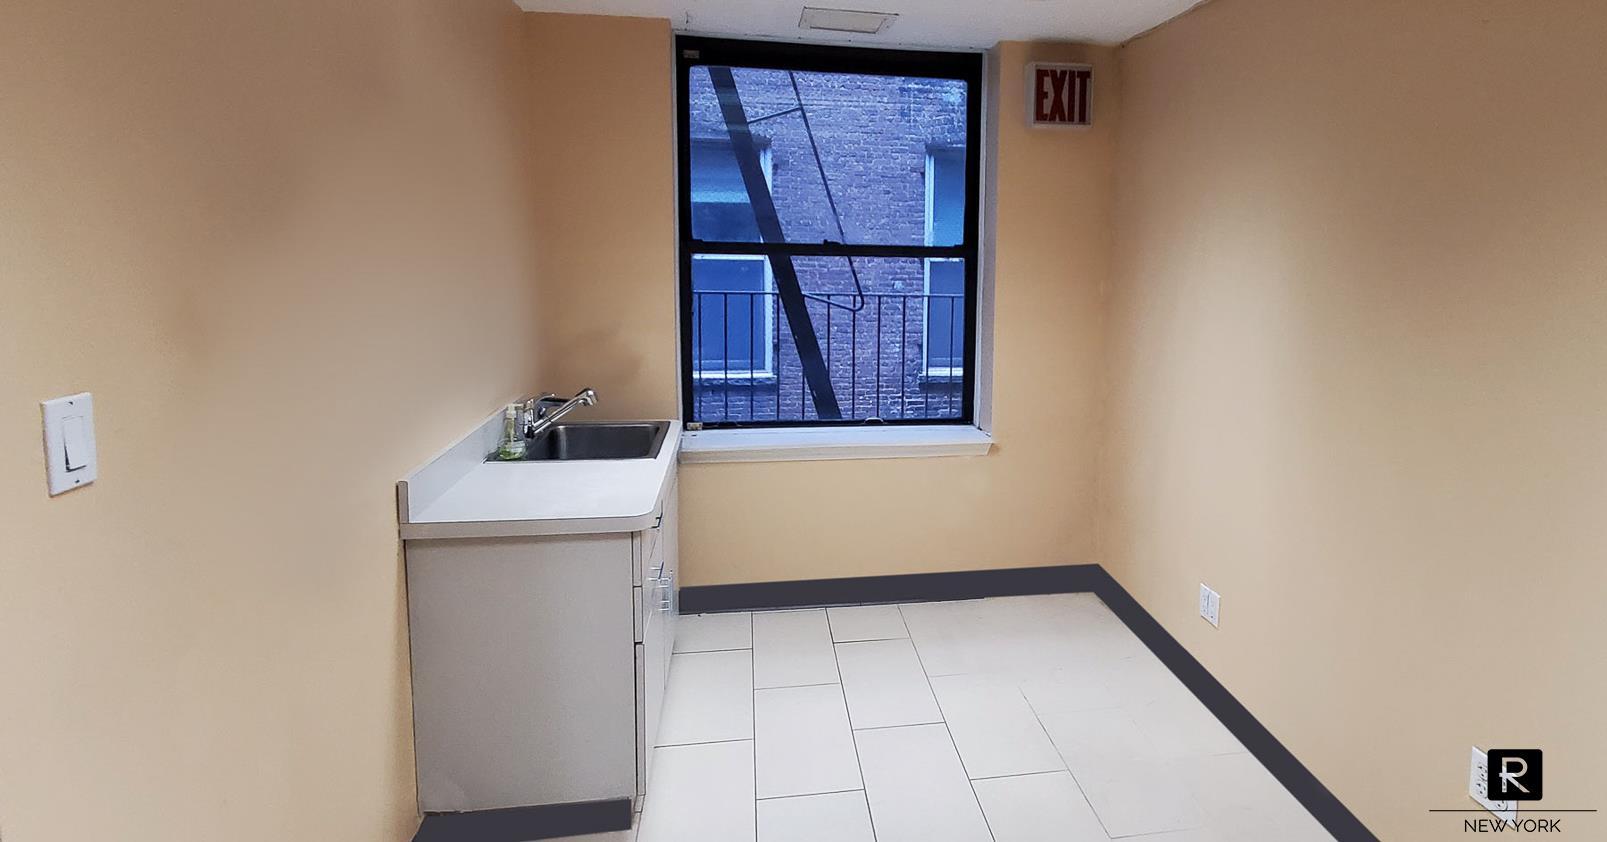 47 East 19th Street Flatiron District New York NY 10003